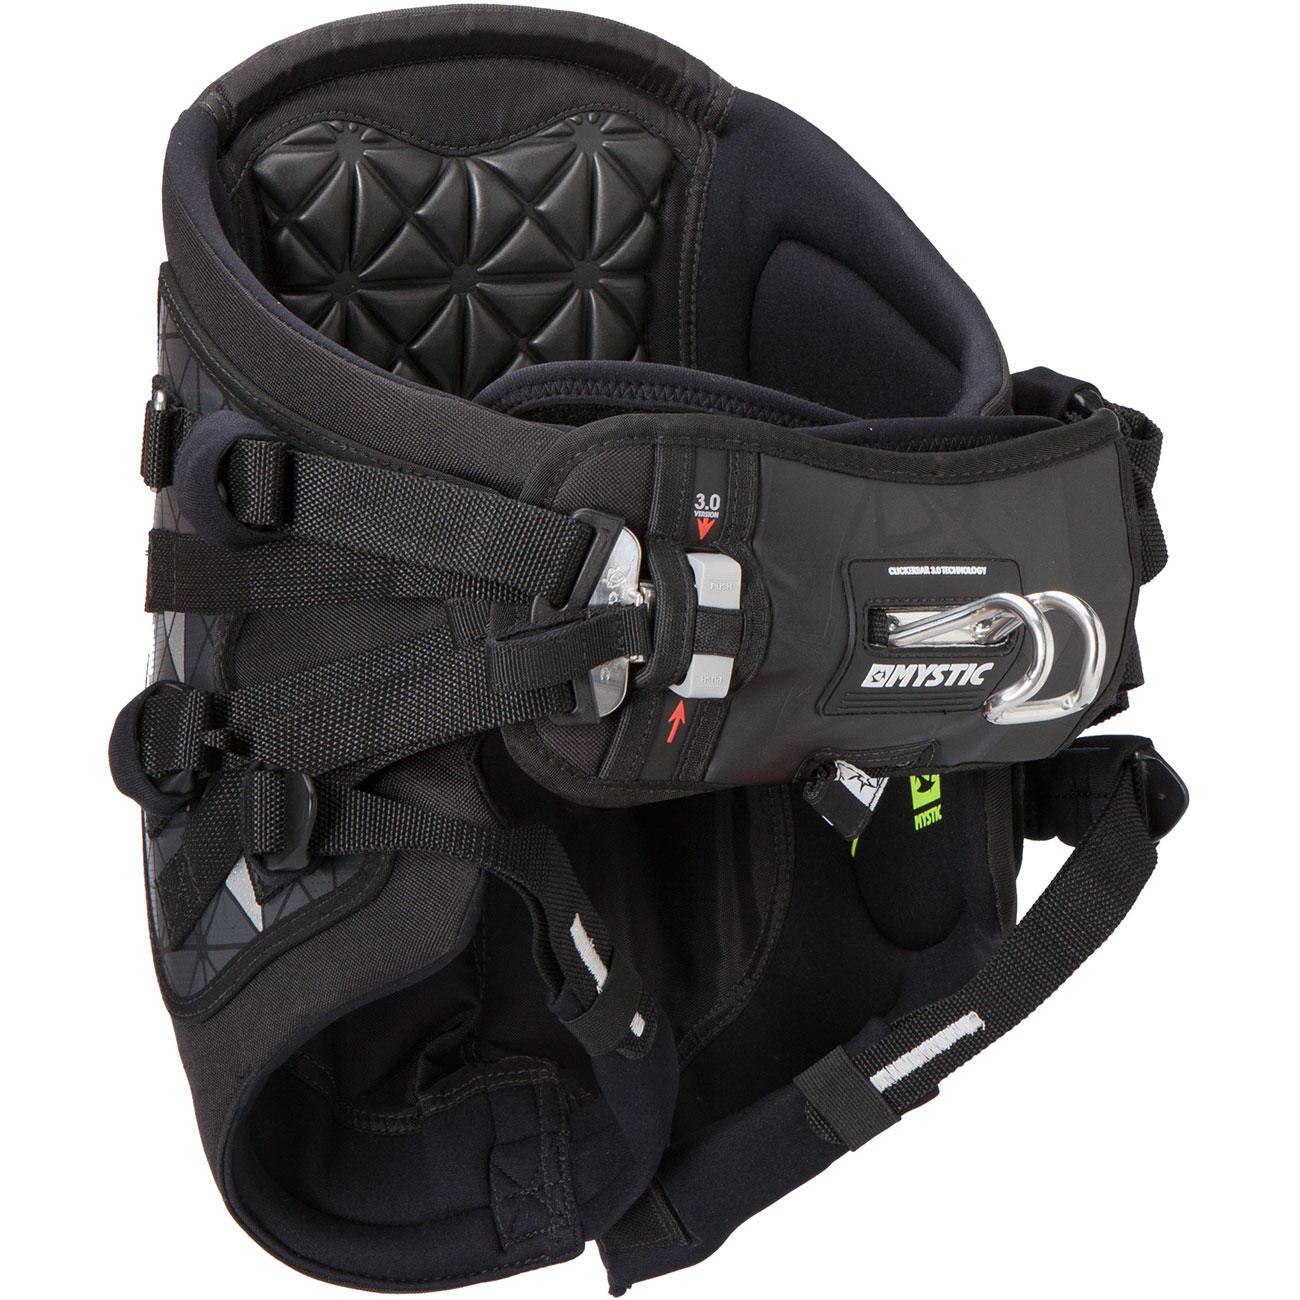 Comforter Seat harness